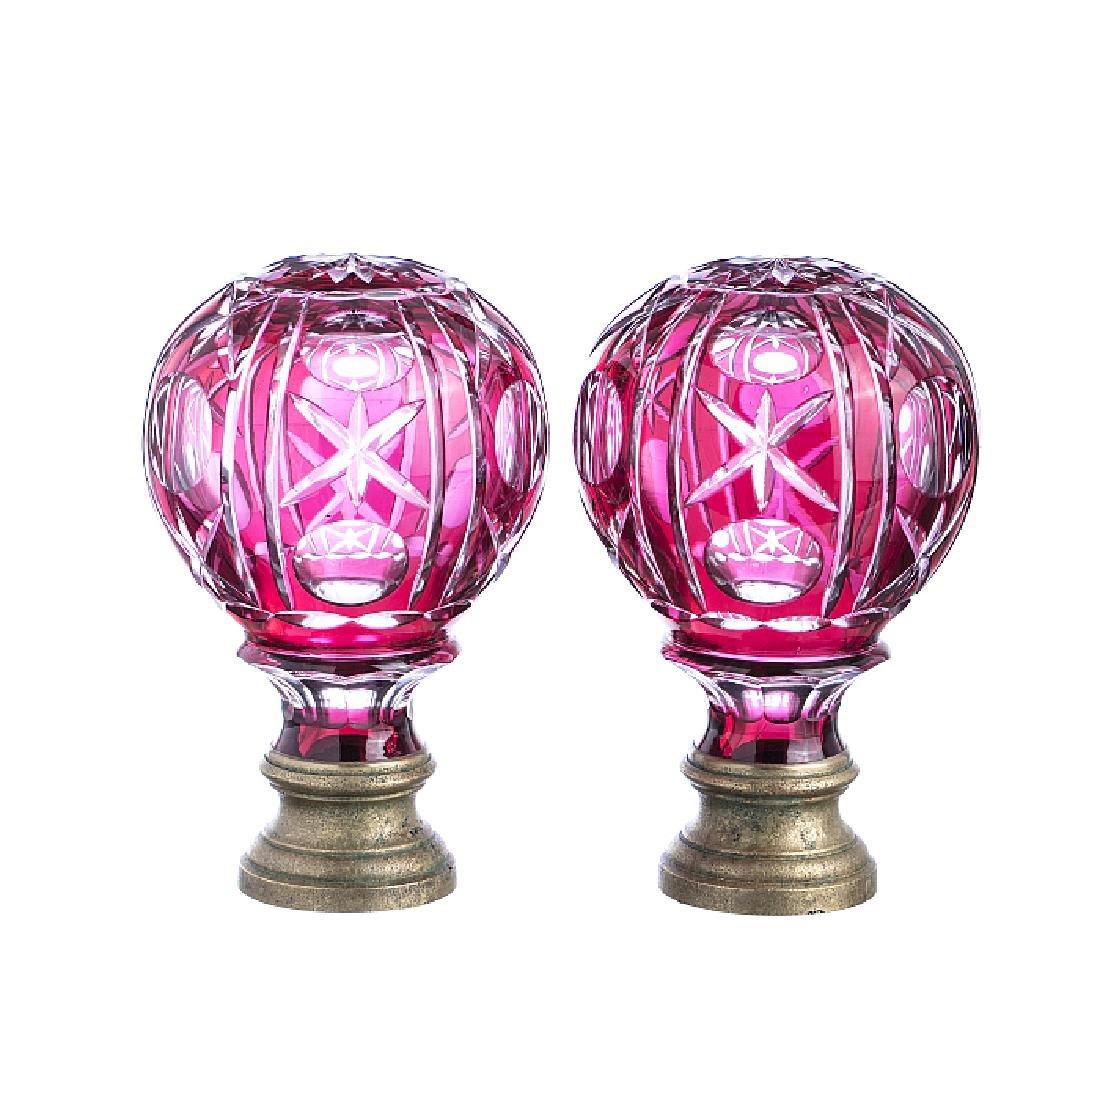 Pair of handrail knobs in crystal